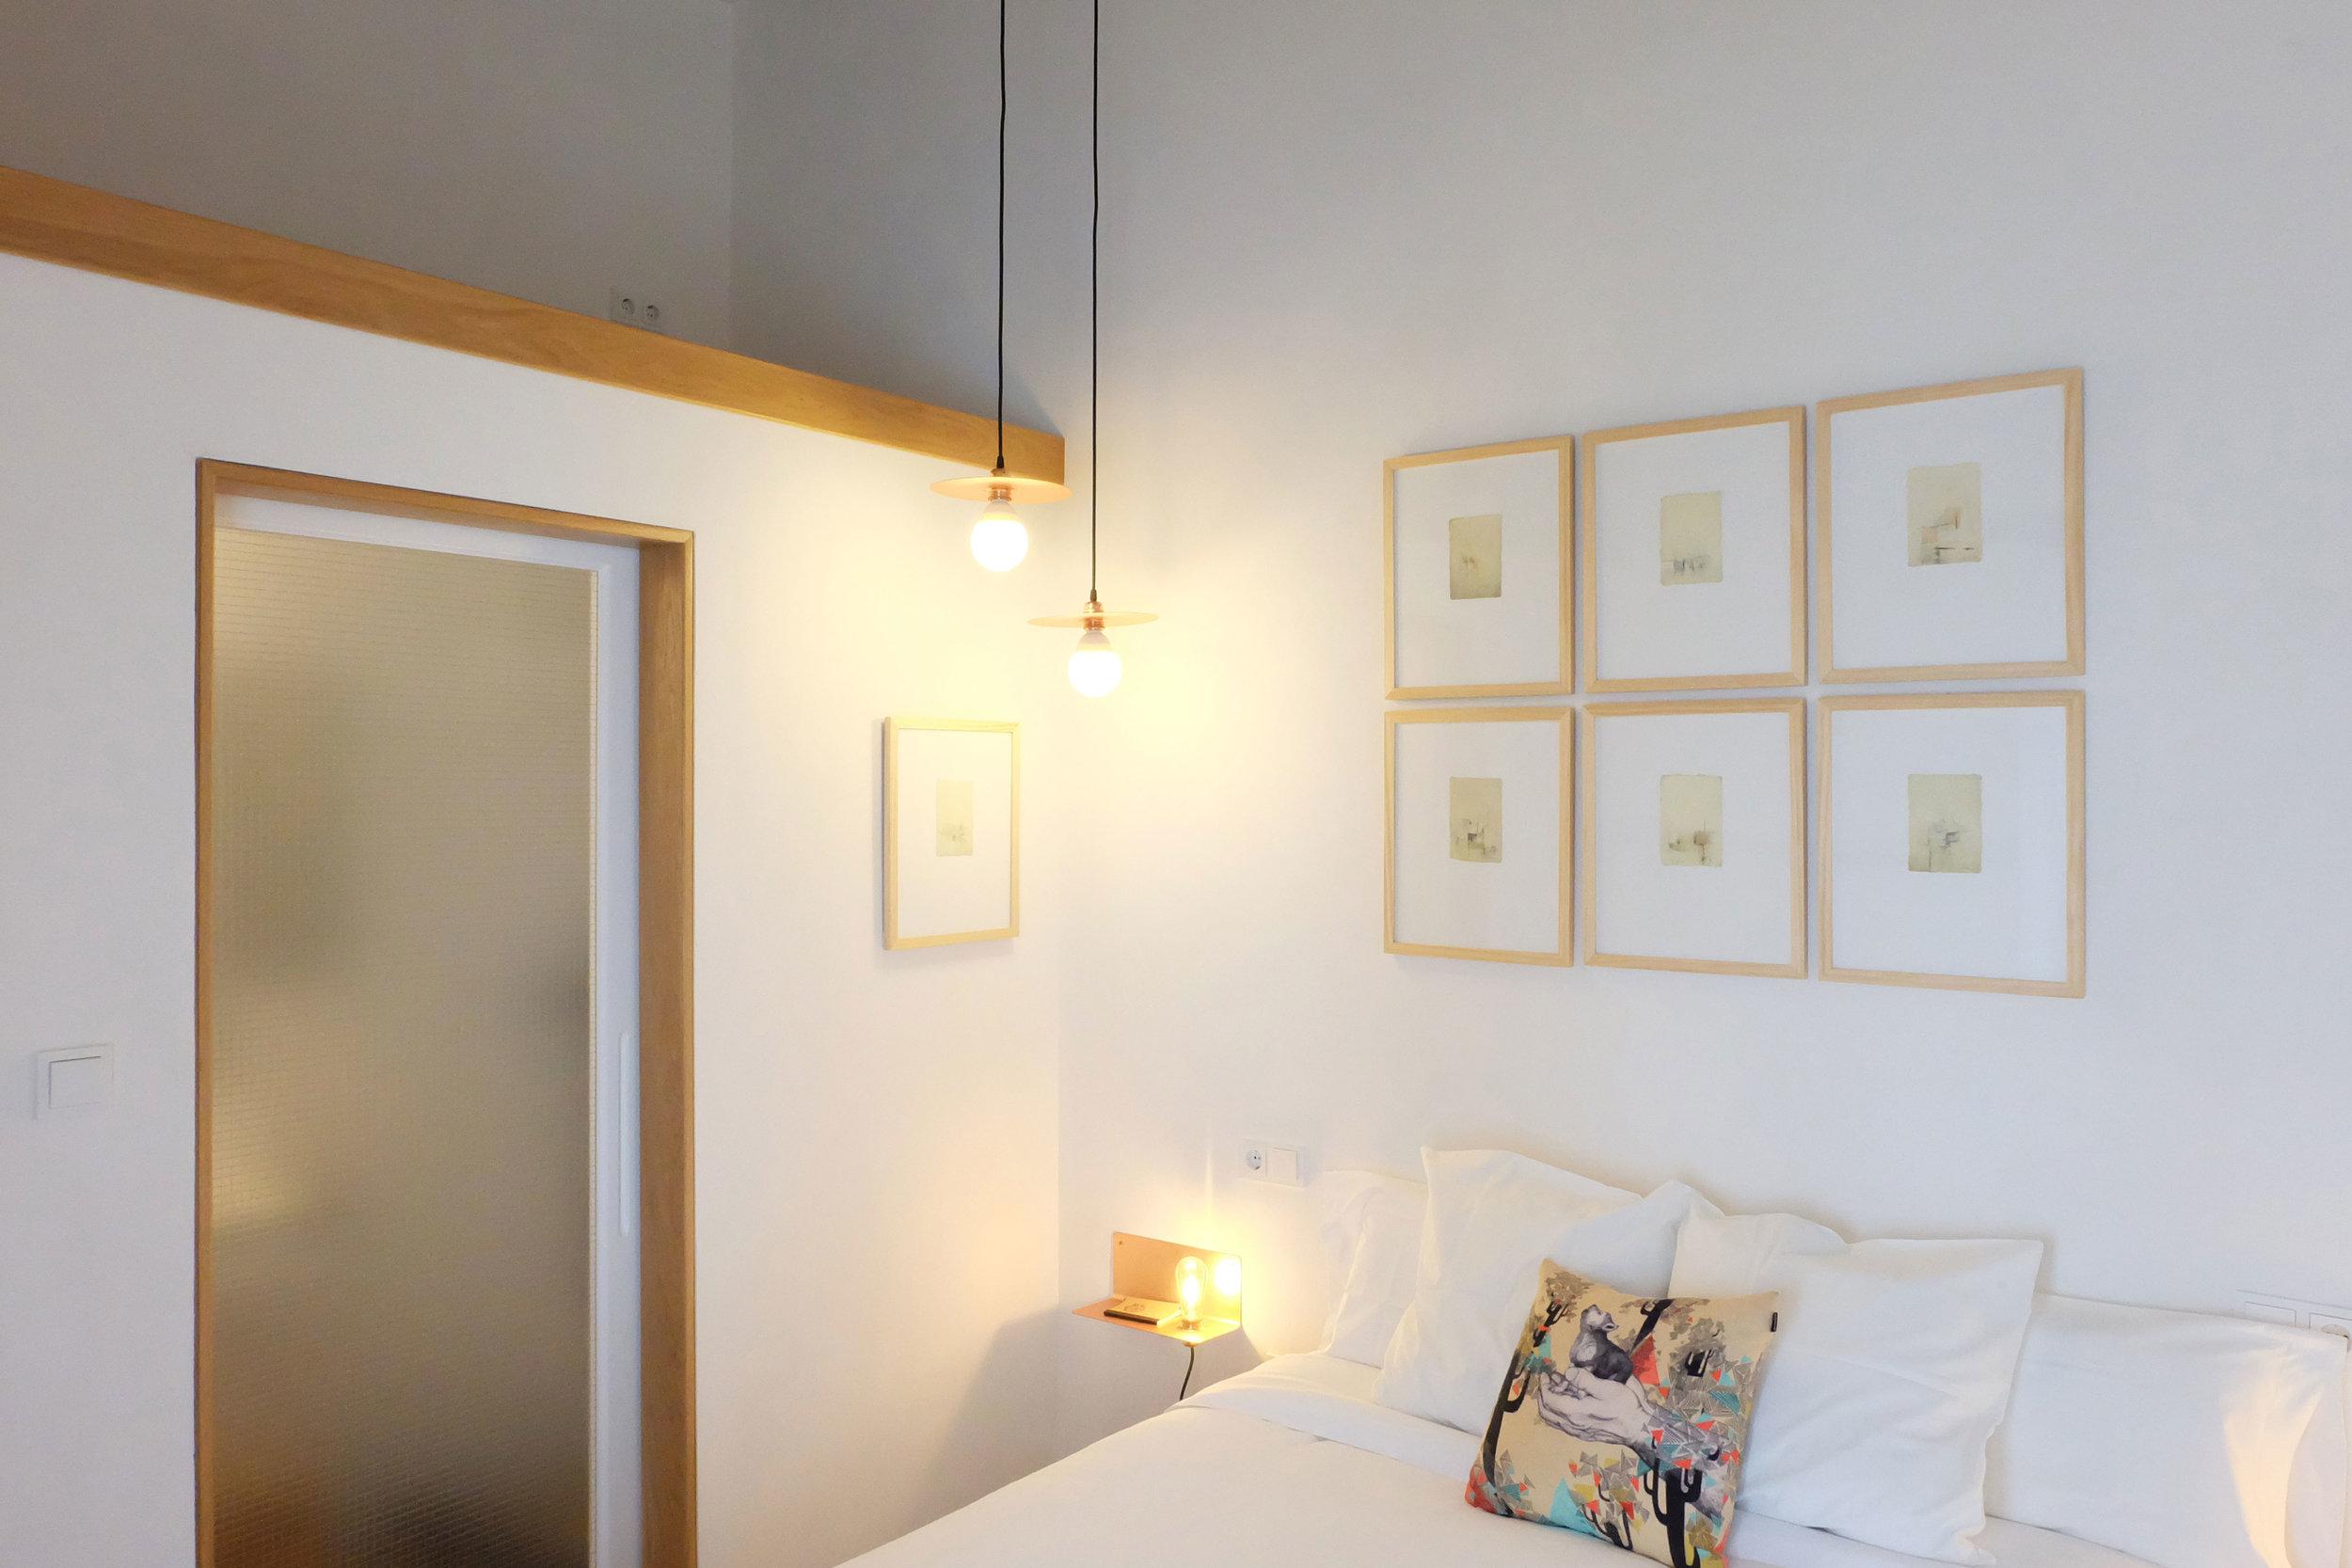 Hotel-Casa-de-Huespedes-Santa-Maria-Habitacion-10-17.jpg